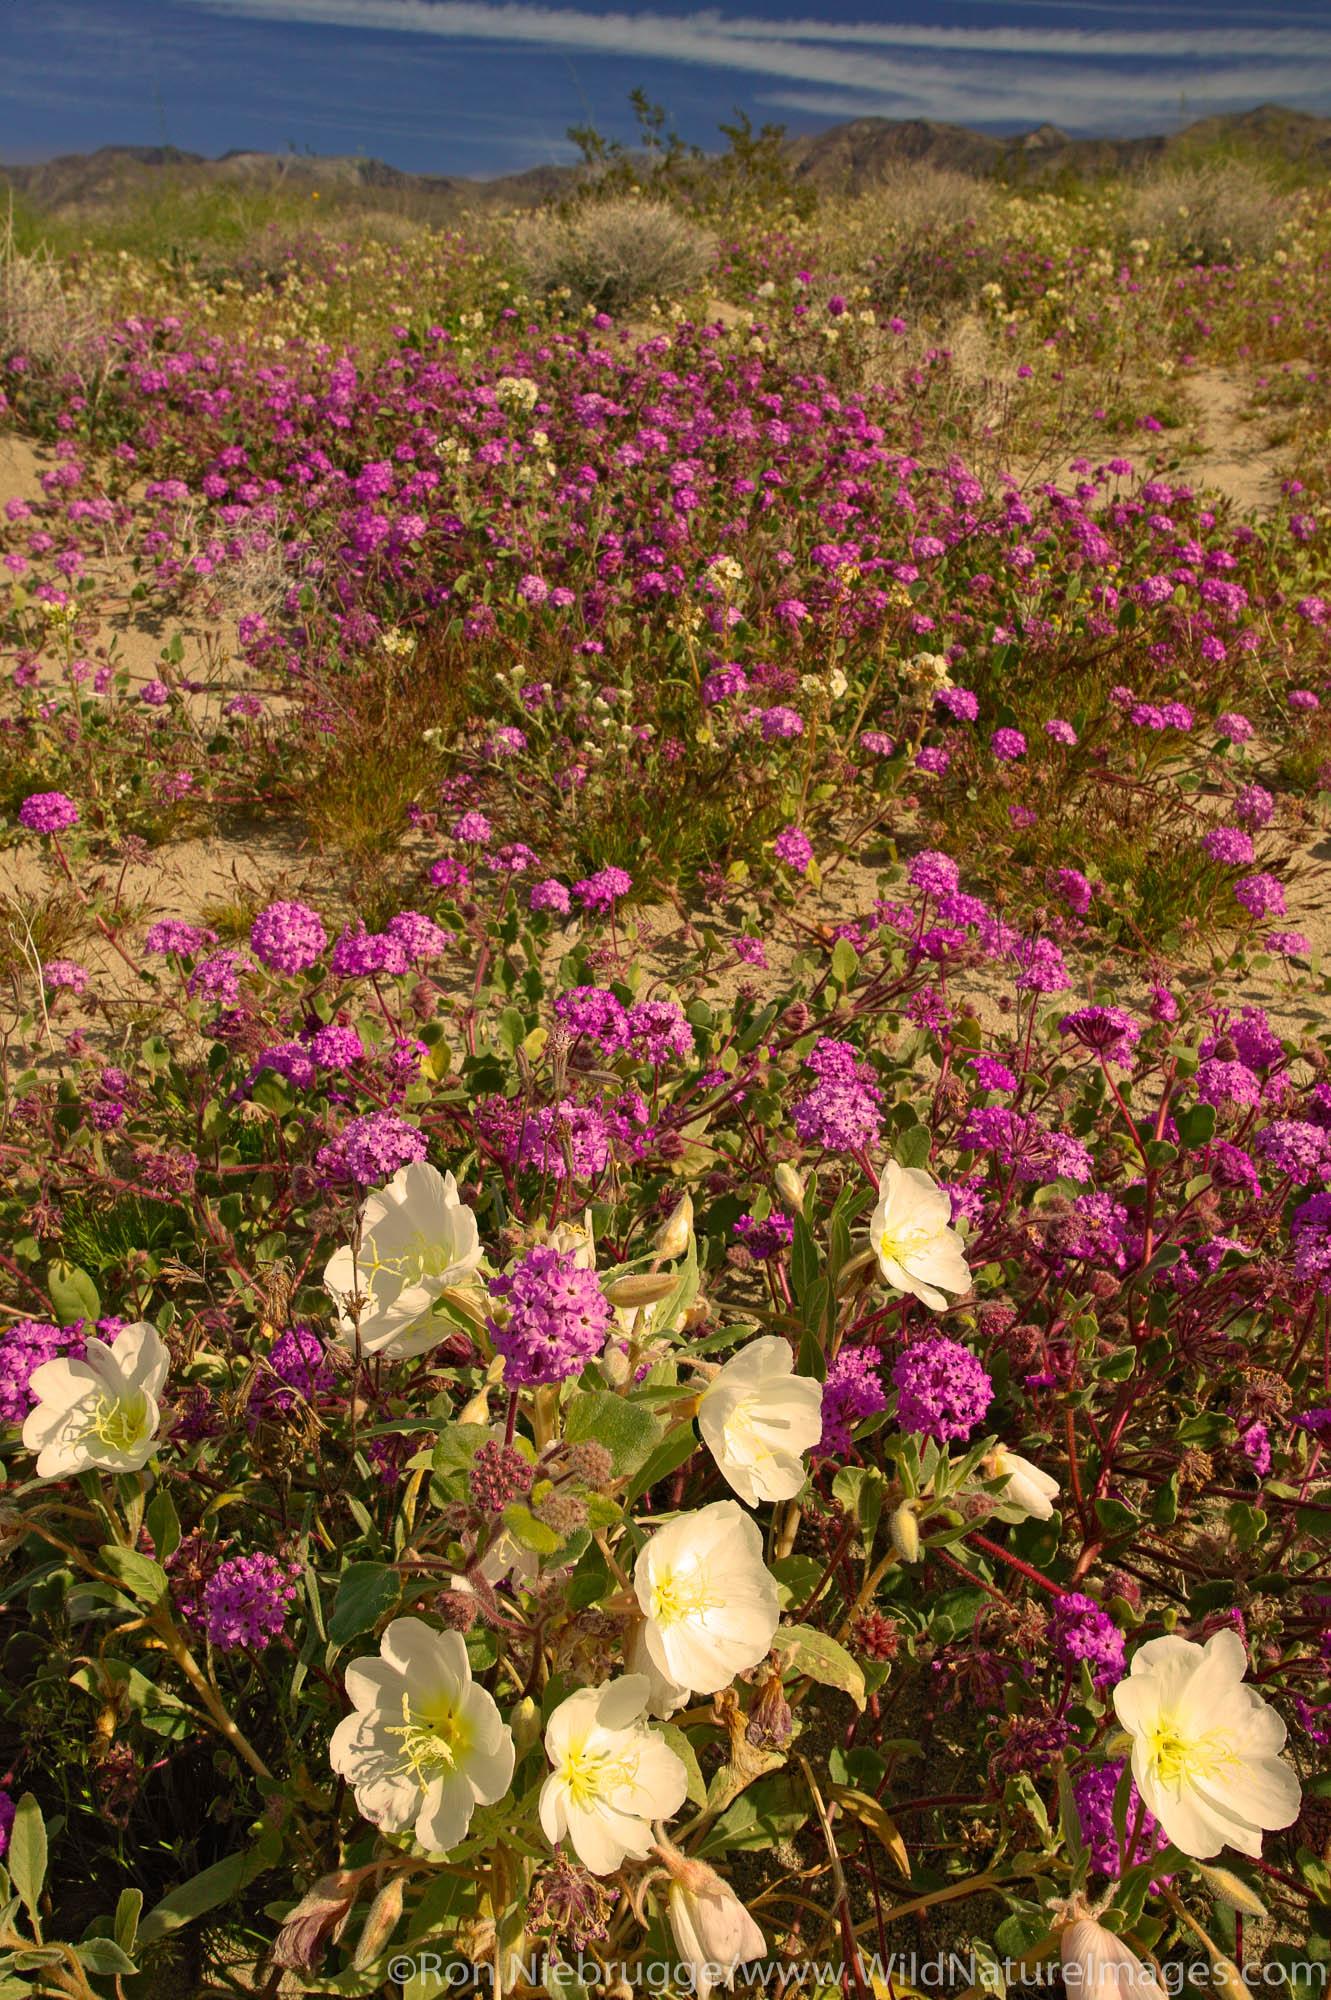 Sand Verbena (Abronia villosa) and Dune Evening Primrose (Oenothera deltoides) on sand dunes near Arroyo Salado, in Anza-Borrego...